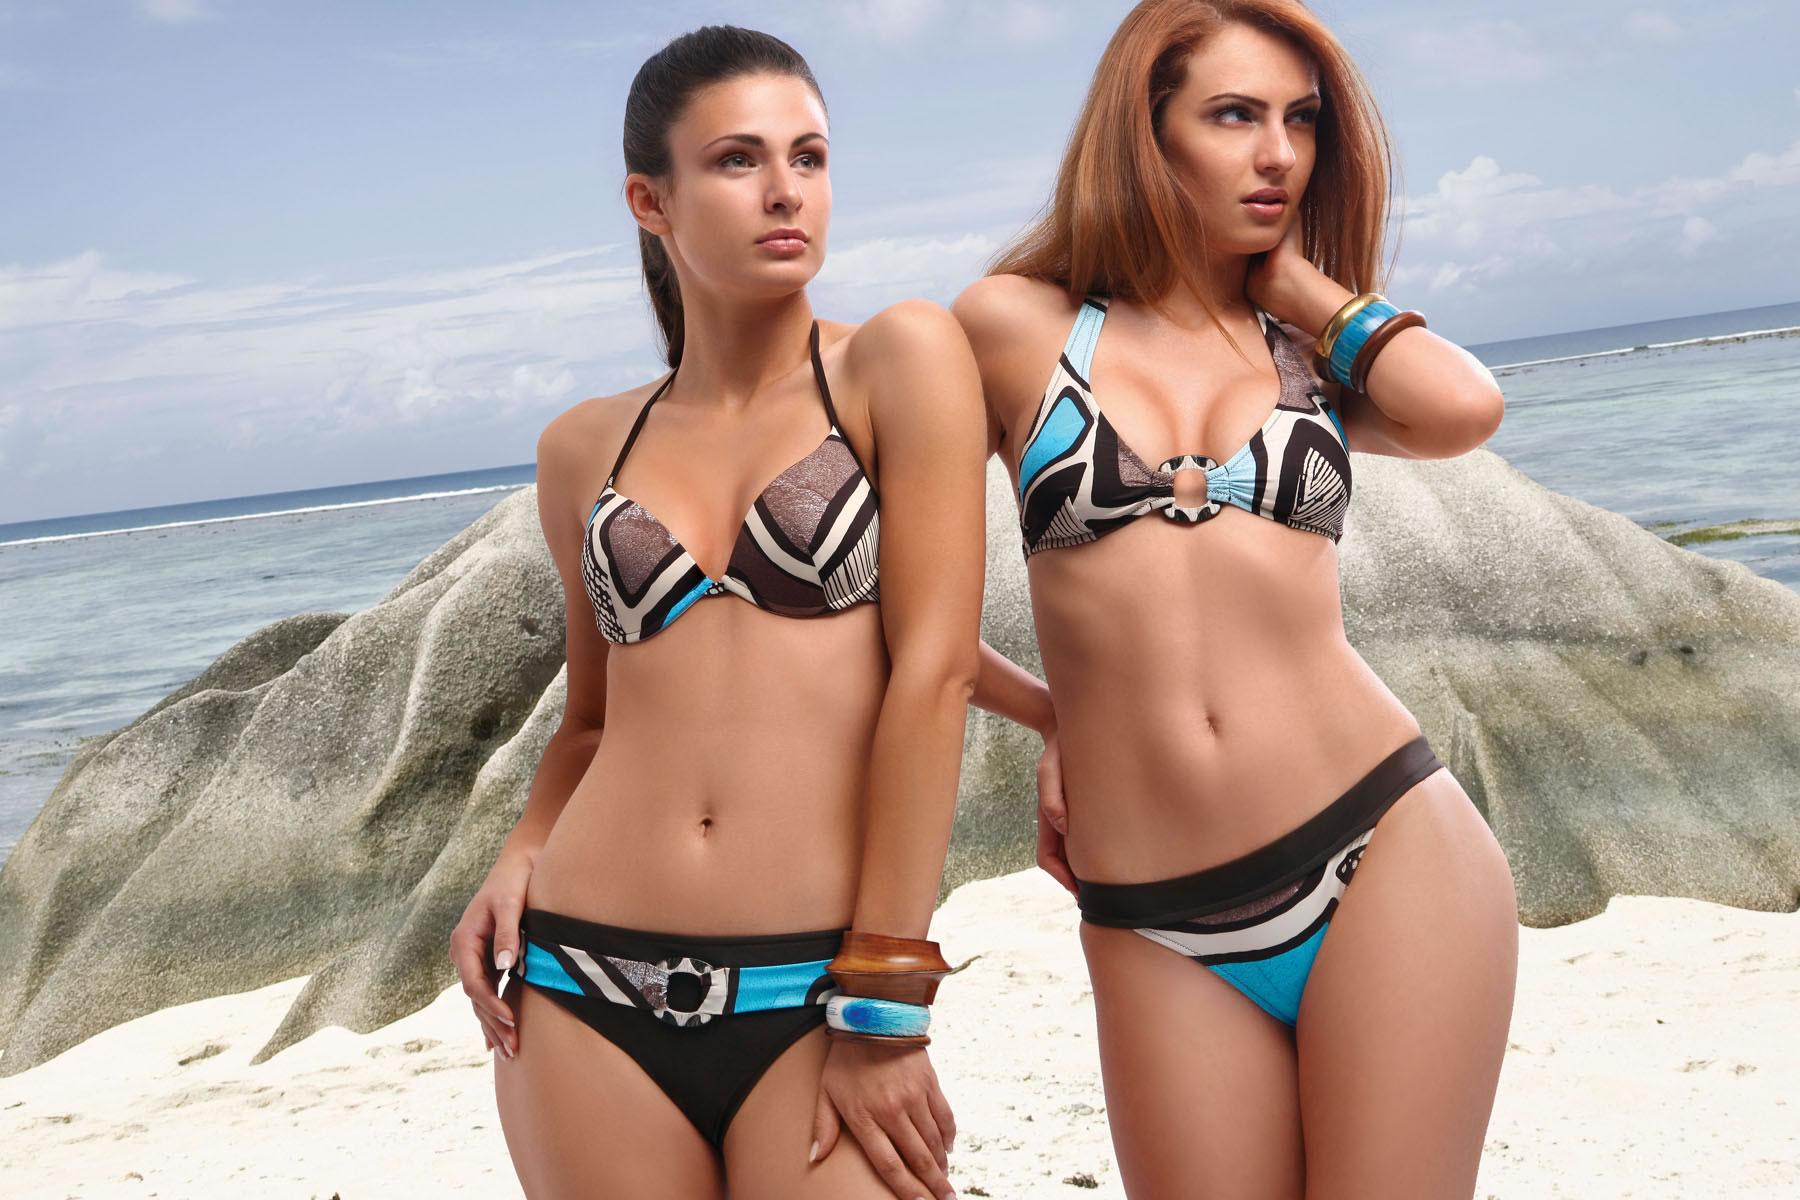 Vaani kapoor wiki, age, biography bikini swimsuit photos